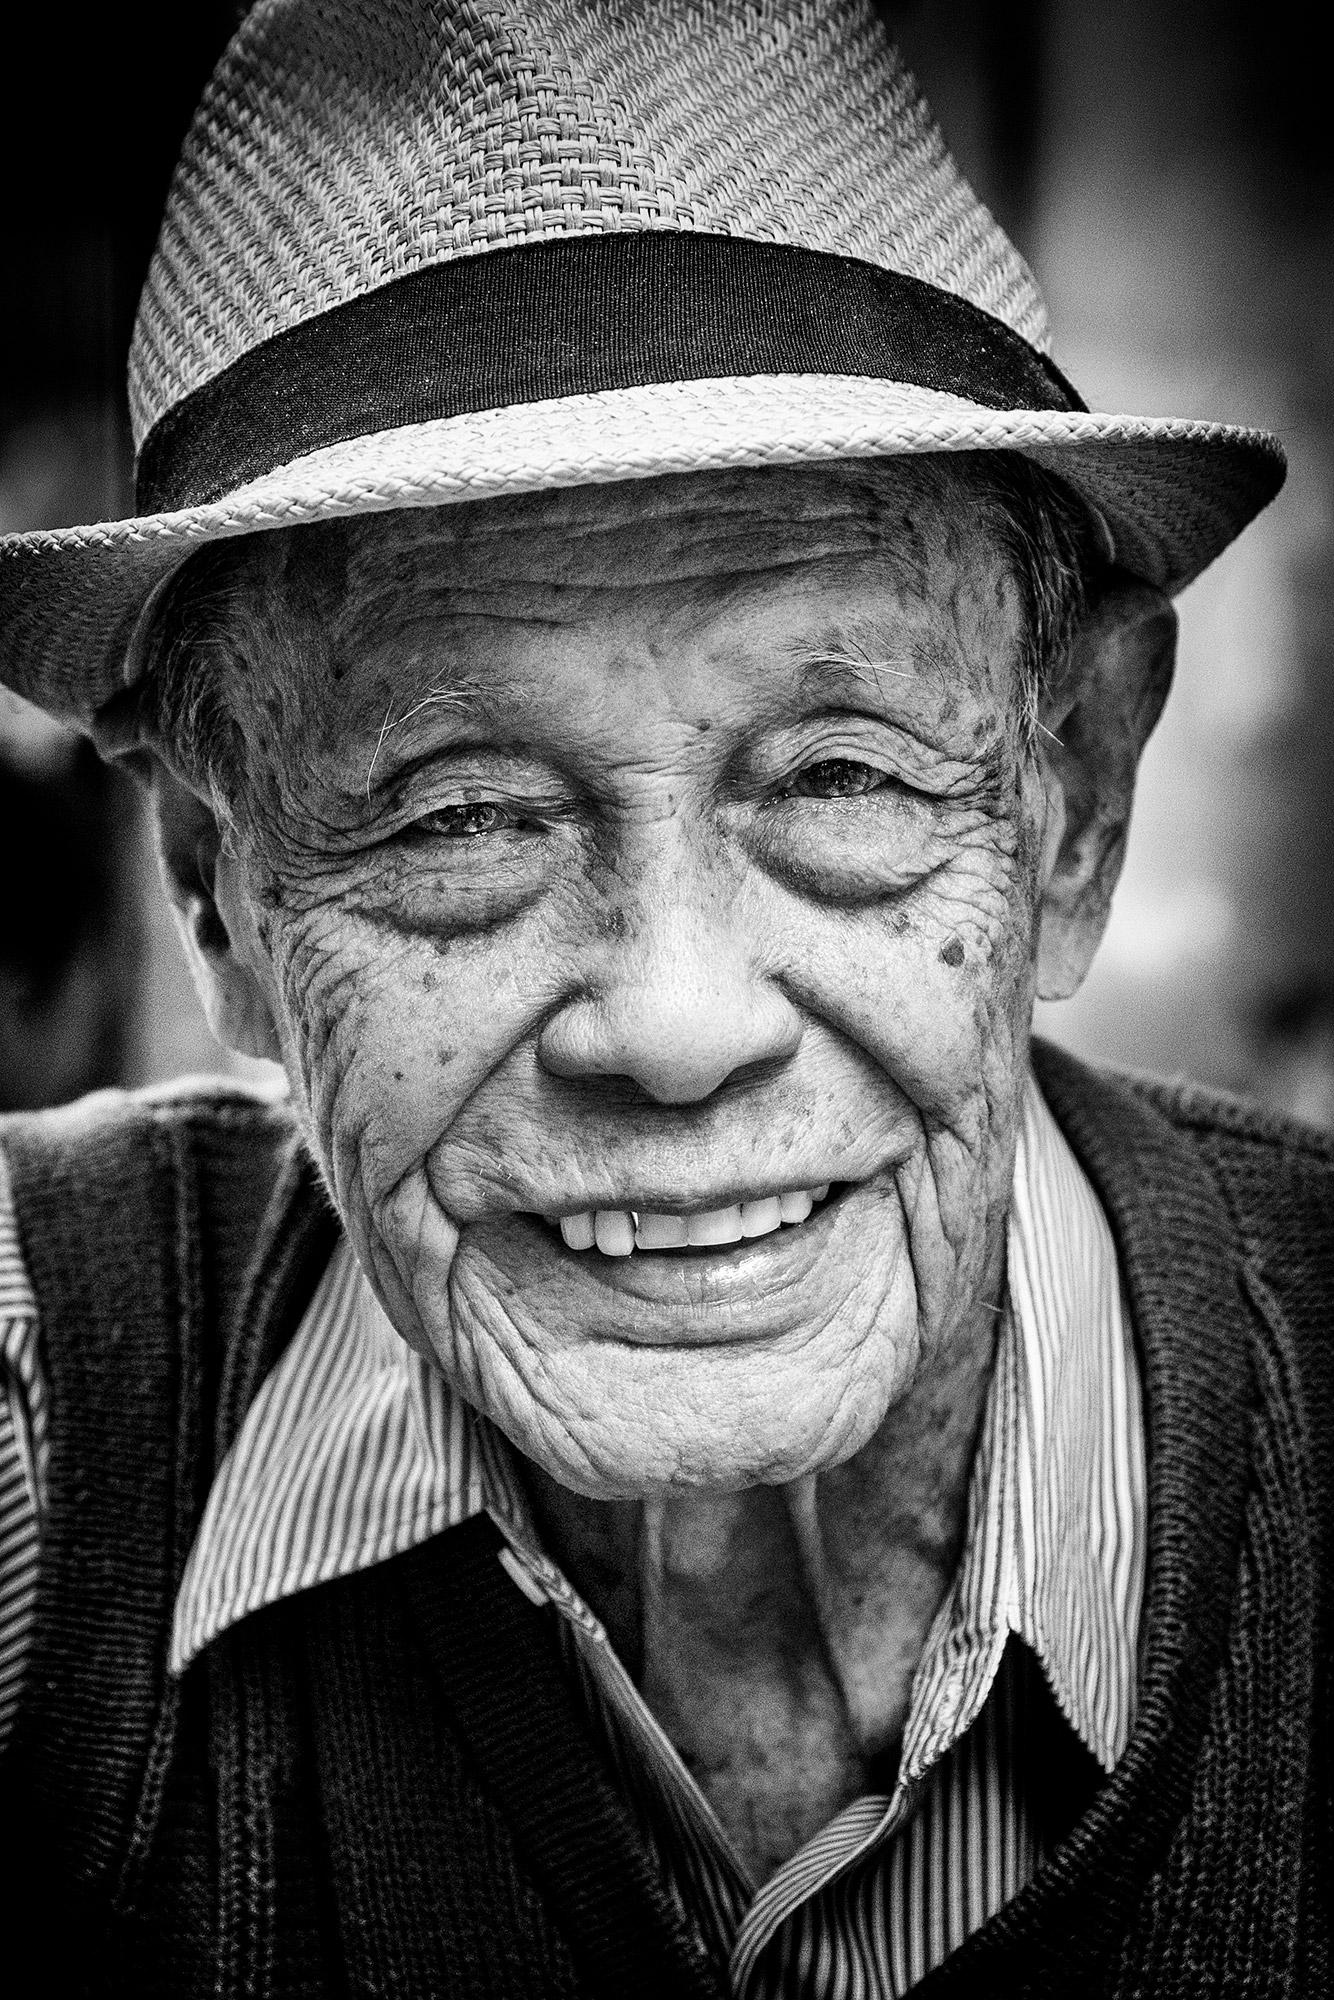 portret oudere man Bangkok